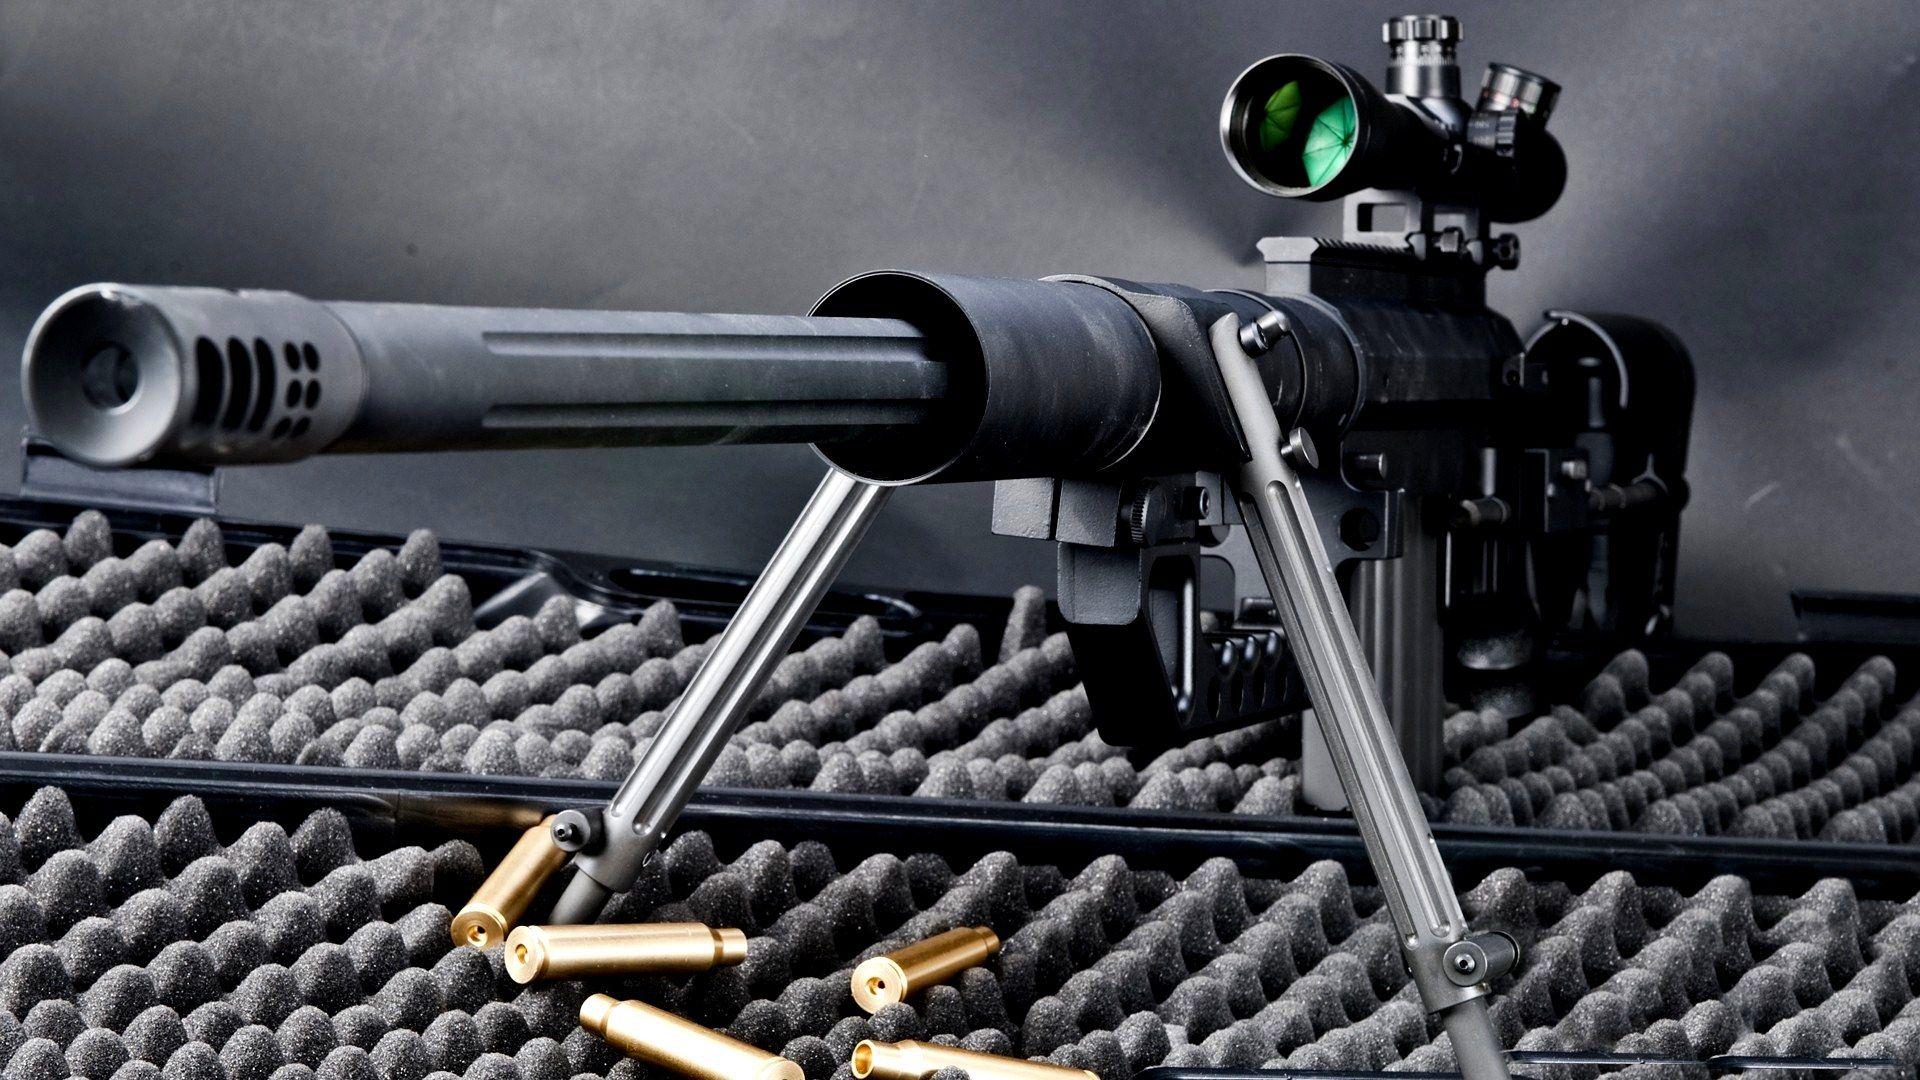 Sniper Rifle Widescreen High Definition Desktop Wallpaper Background Picture